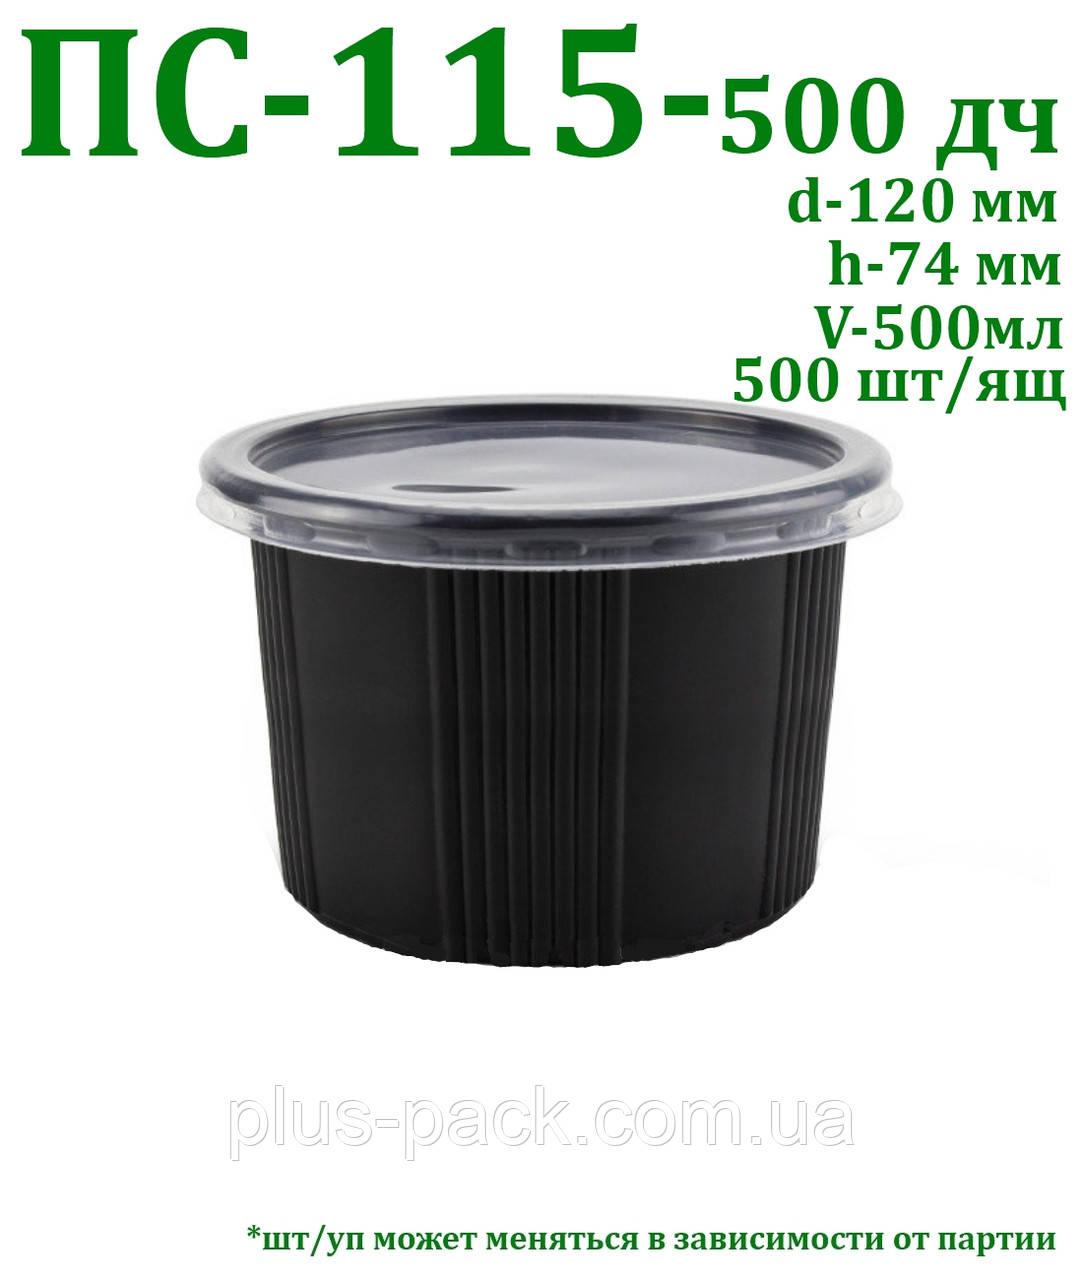 Одноразовая упаковка ПС-115-500